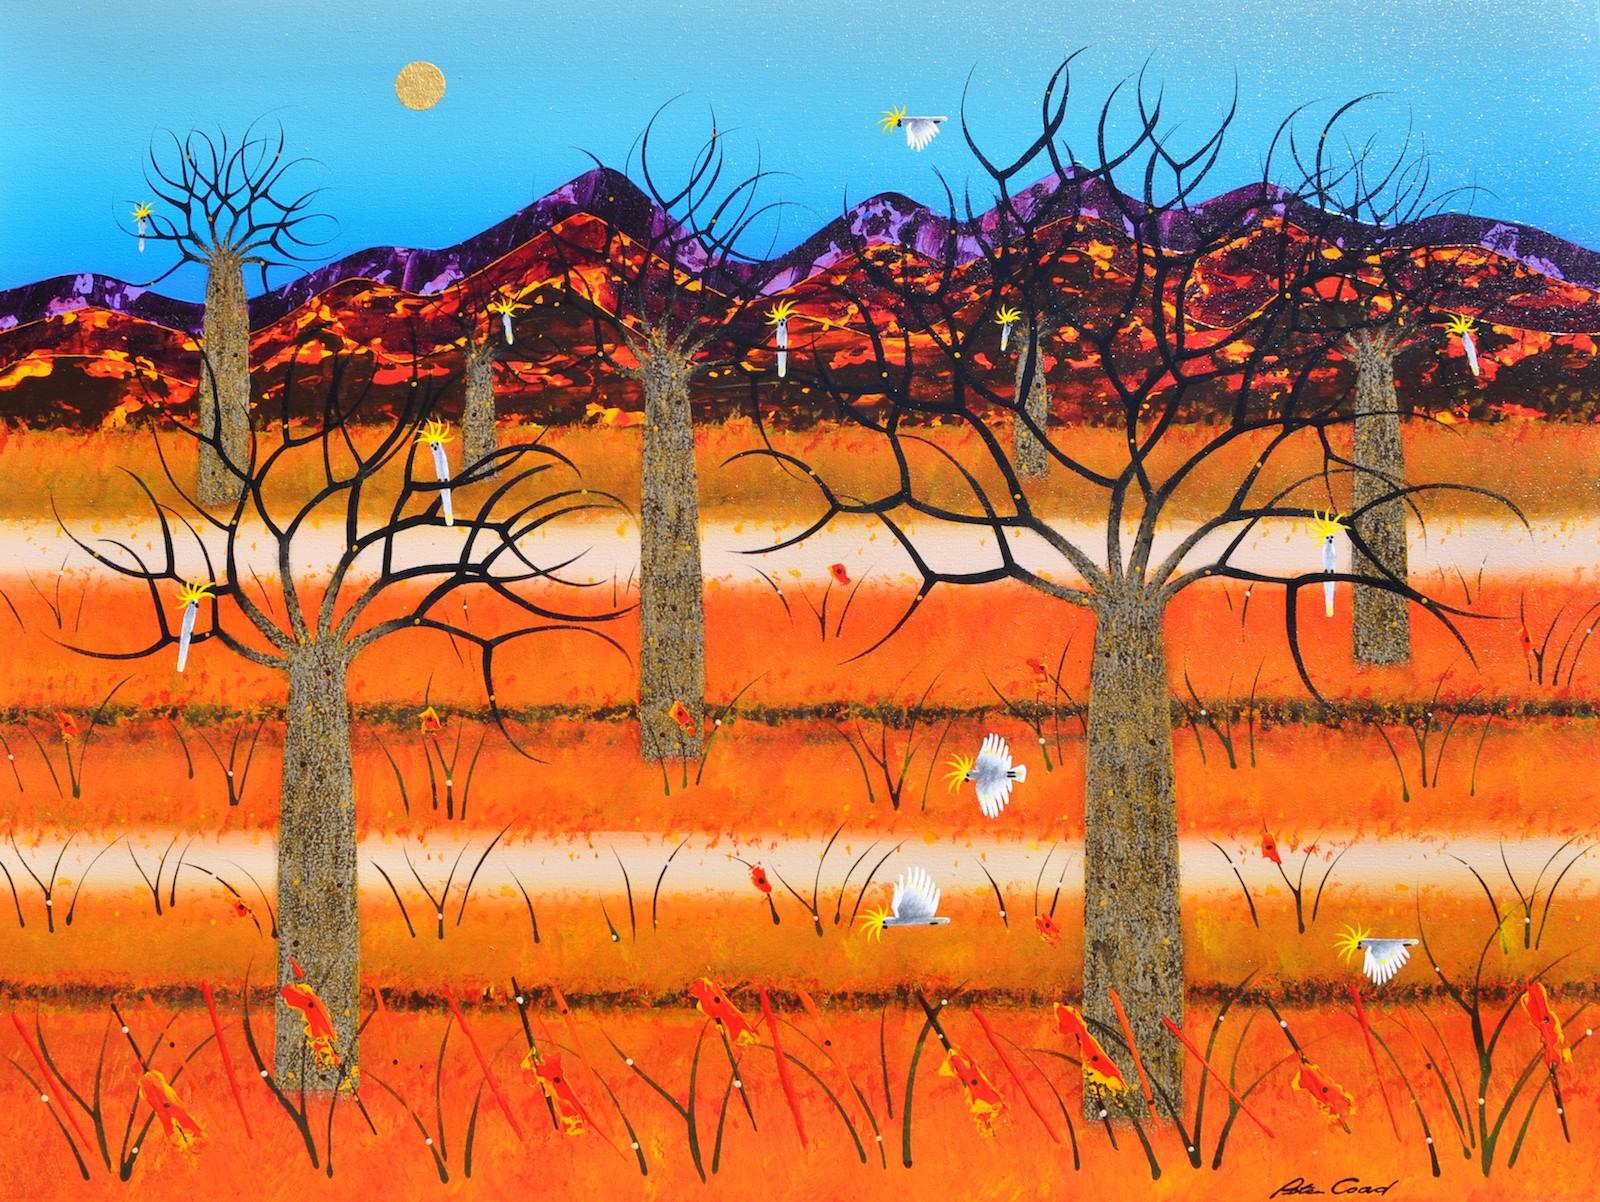 Peter Coad 'Boab Floodplain' 90cm x 120cm canvas #14560